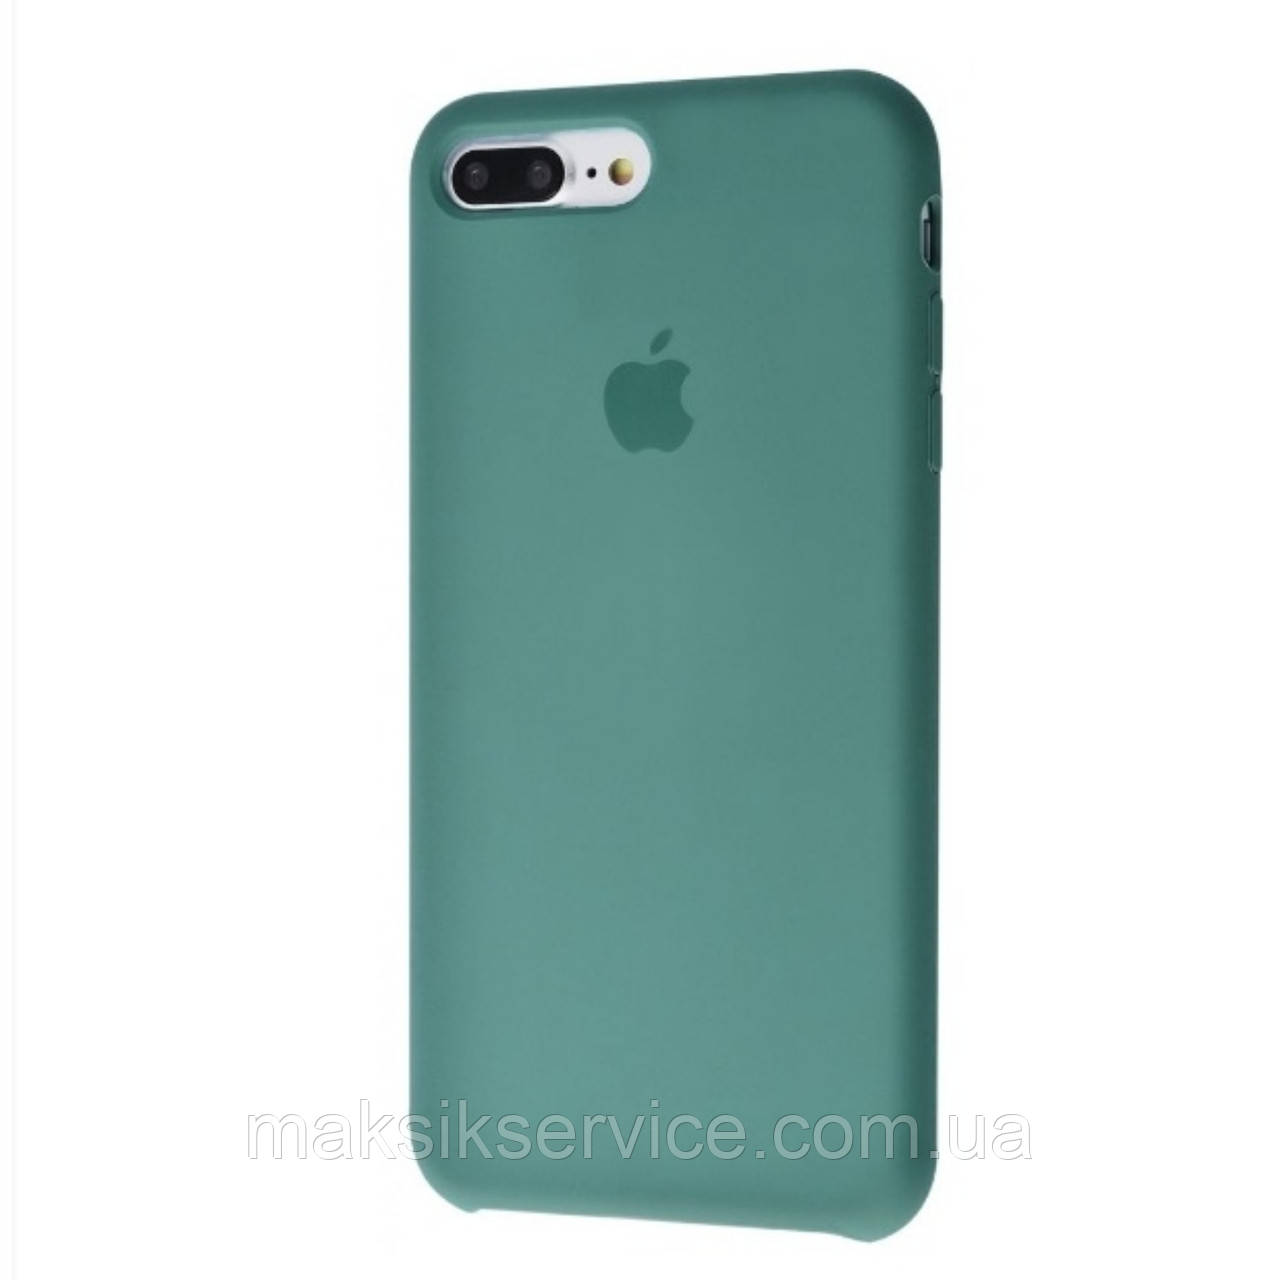 Чехол Silicone Case iPhone 7 Plus/8 Plus pine green